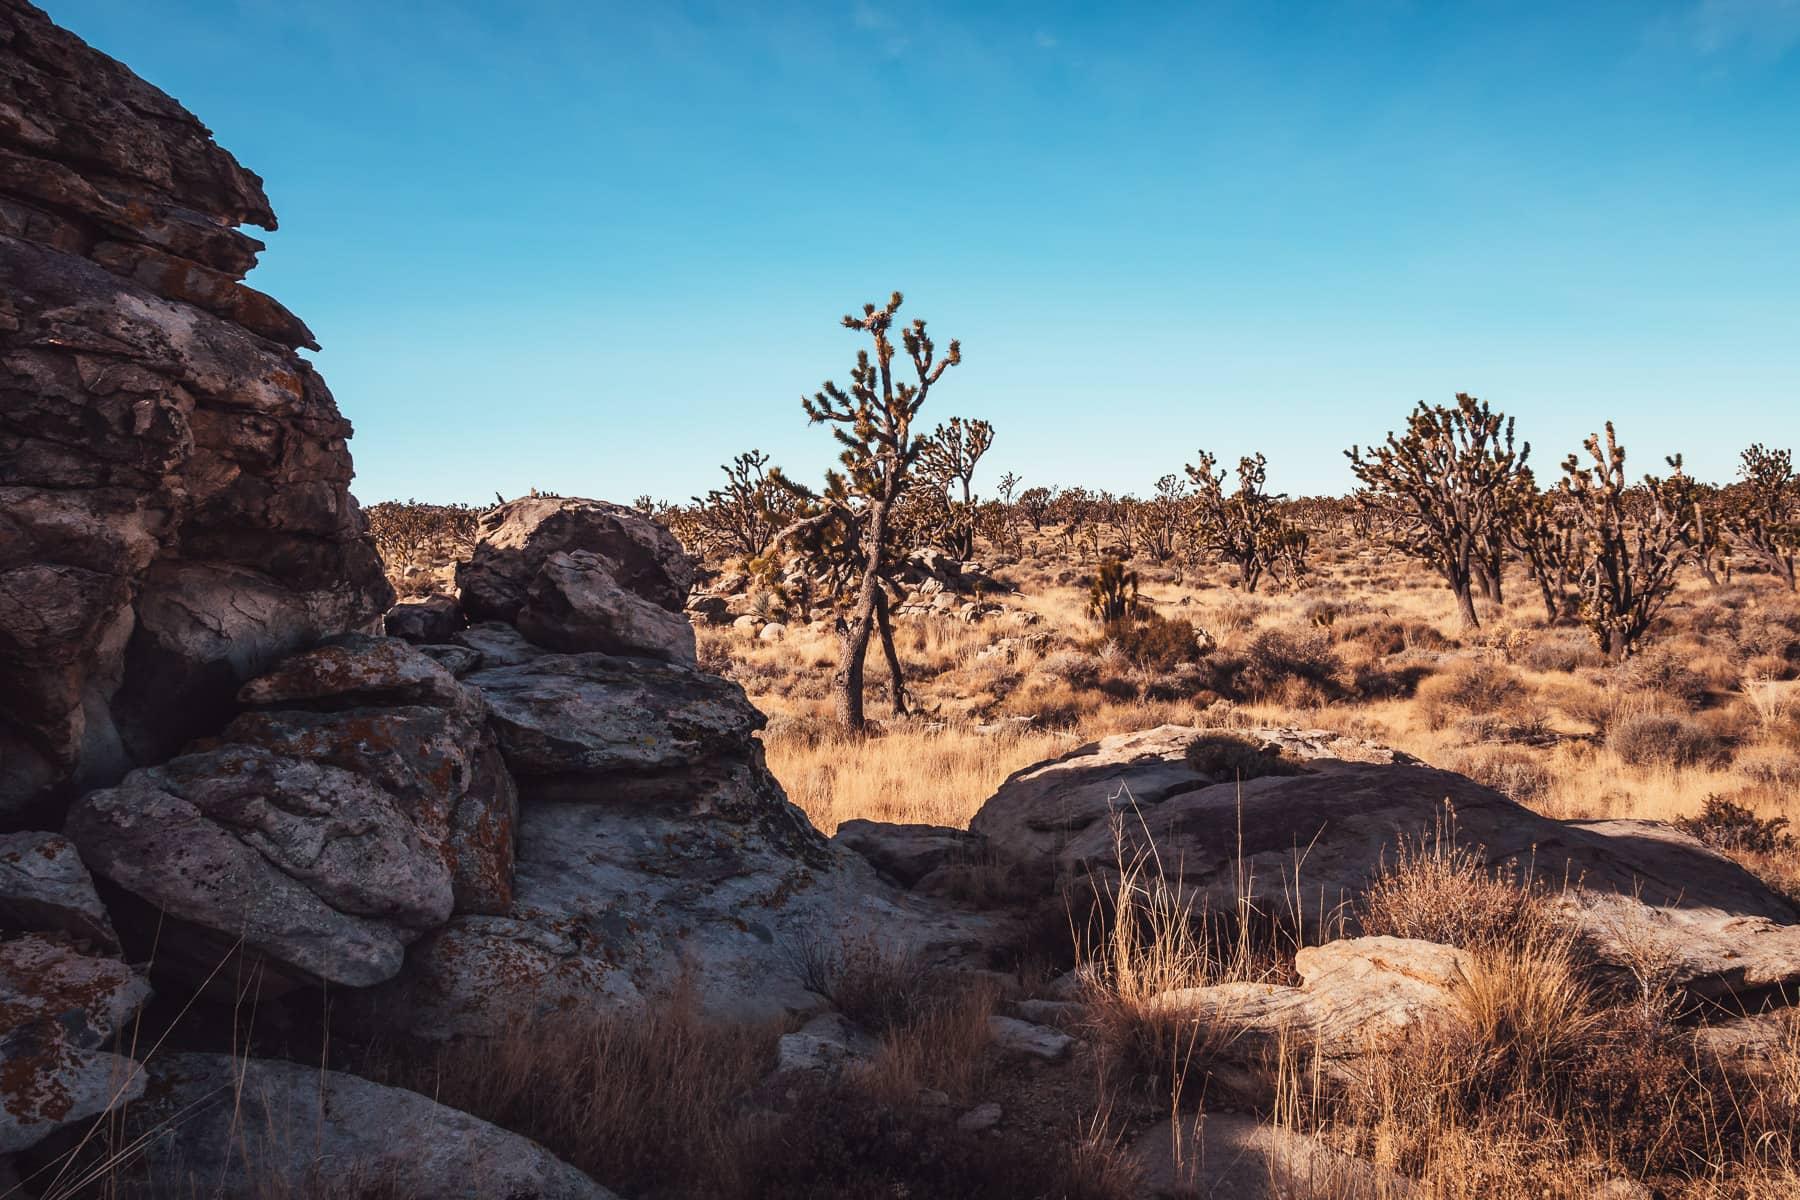 Joshua trees grow among ancient rocks at California's Mojave National Preserve.